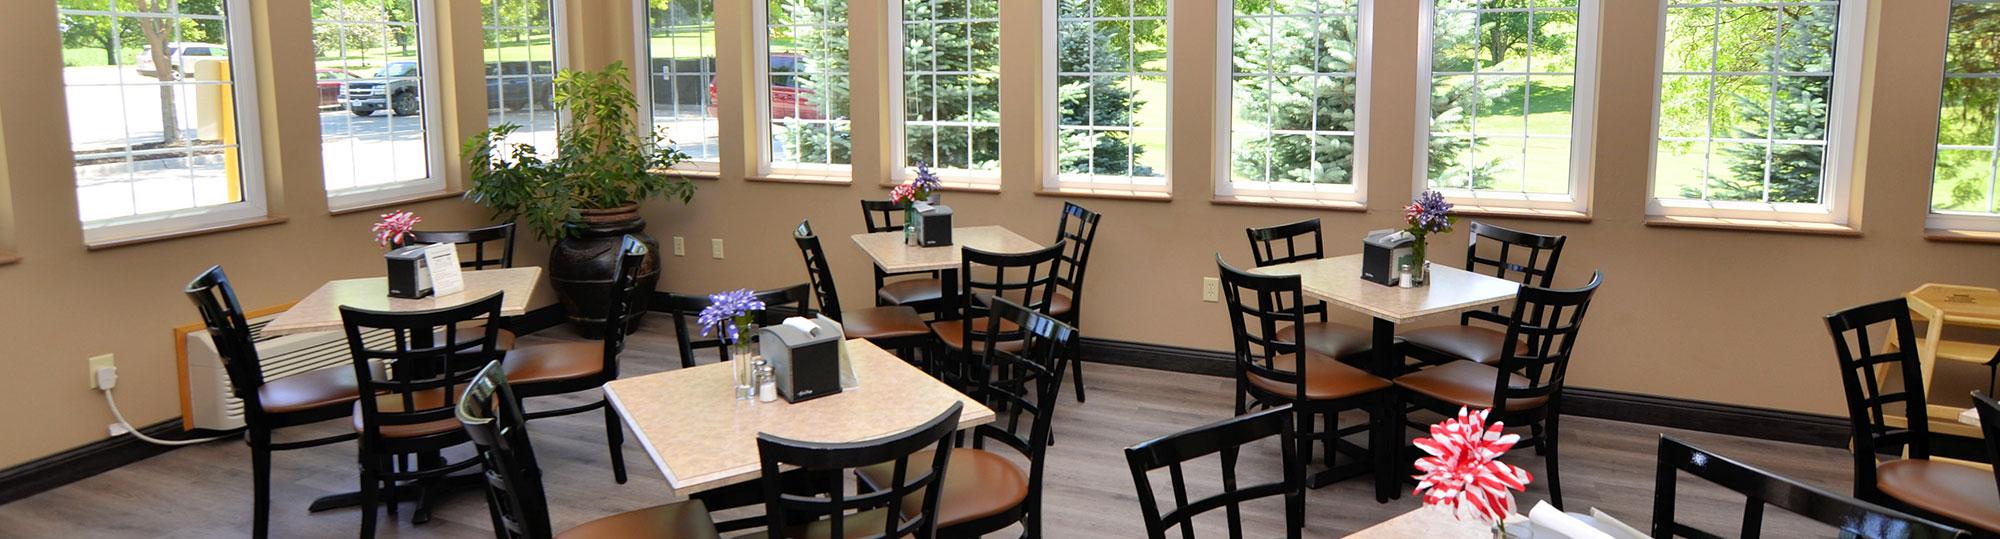 Cobblestone Inn & Suites Denison